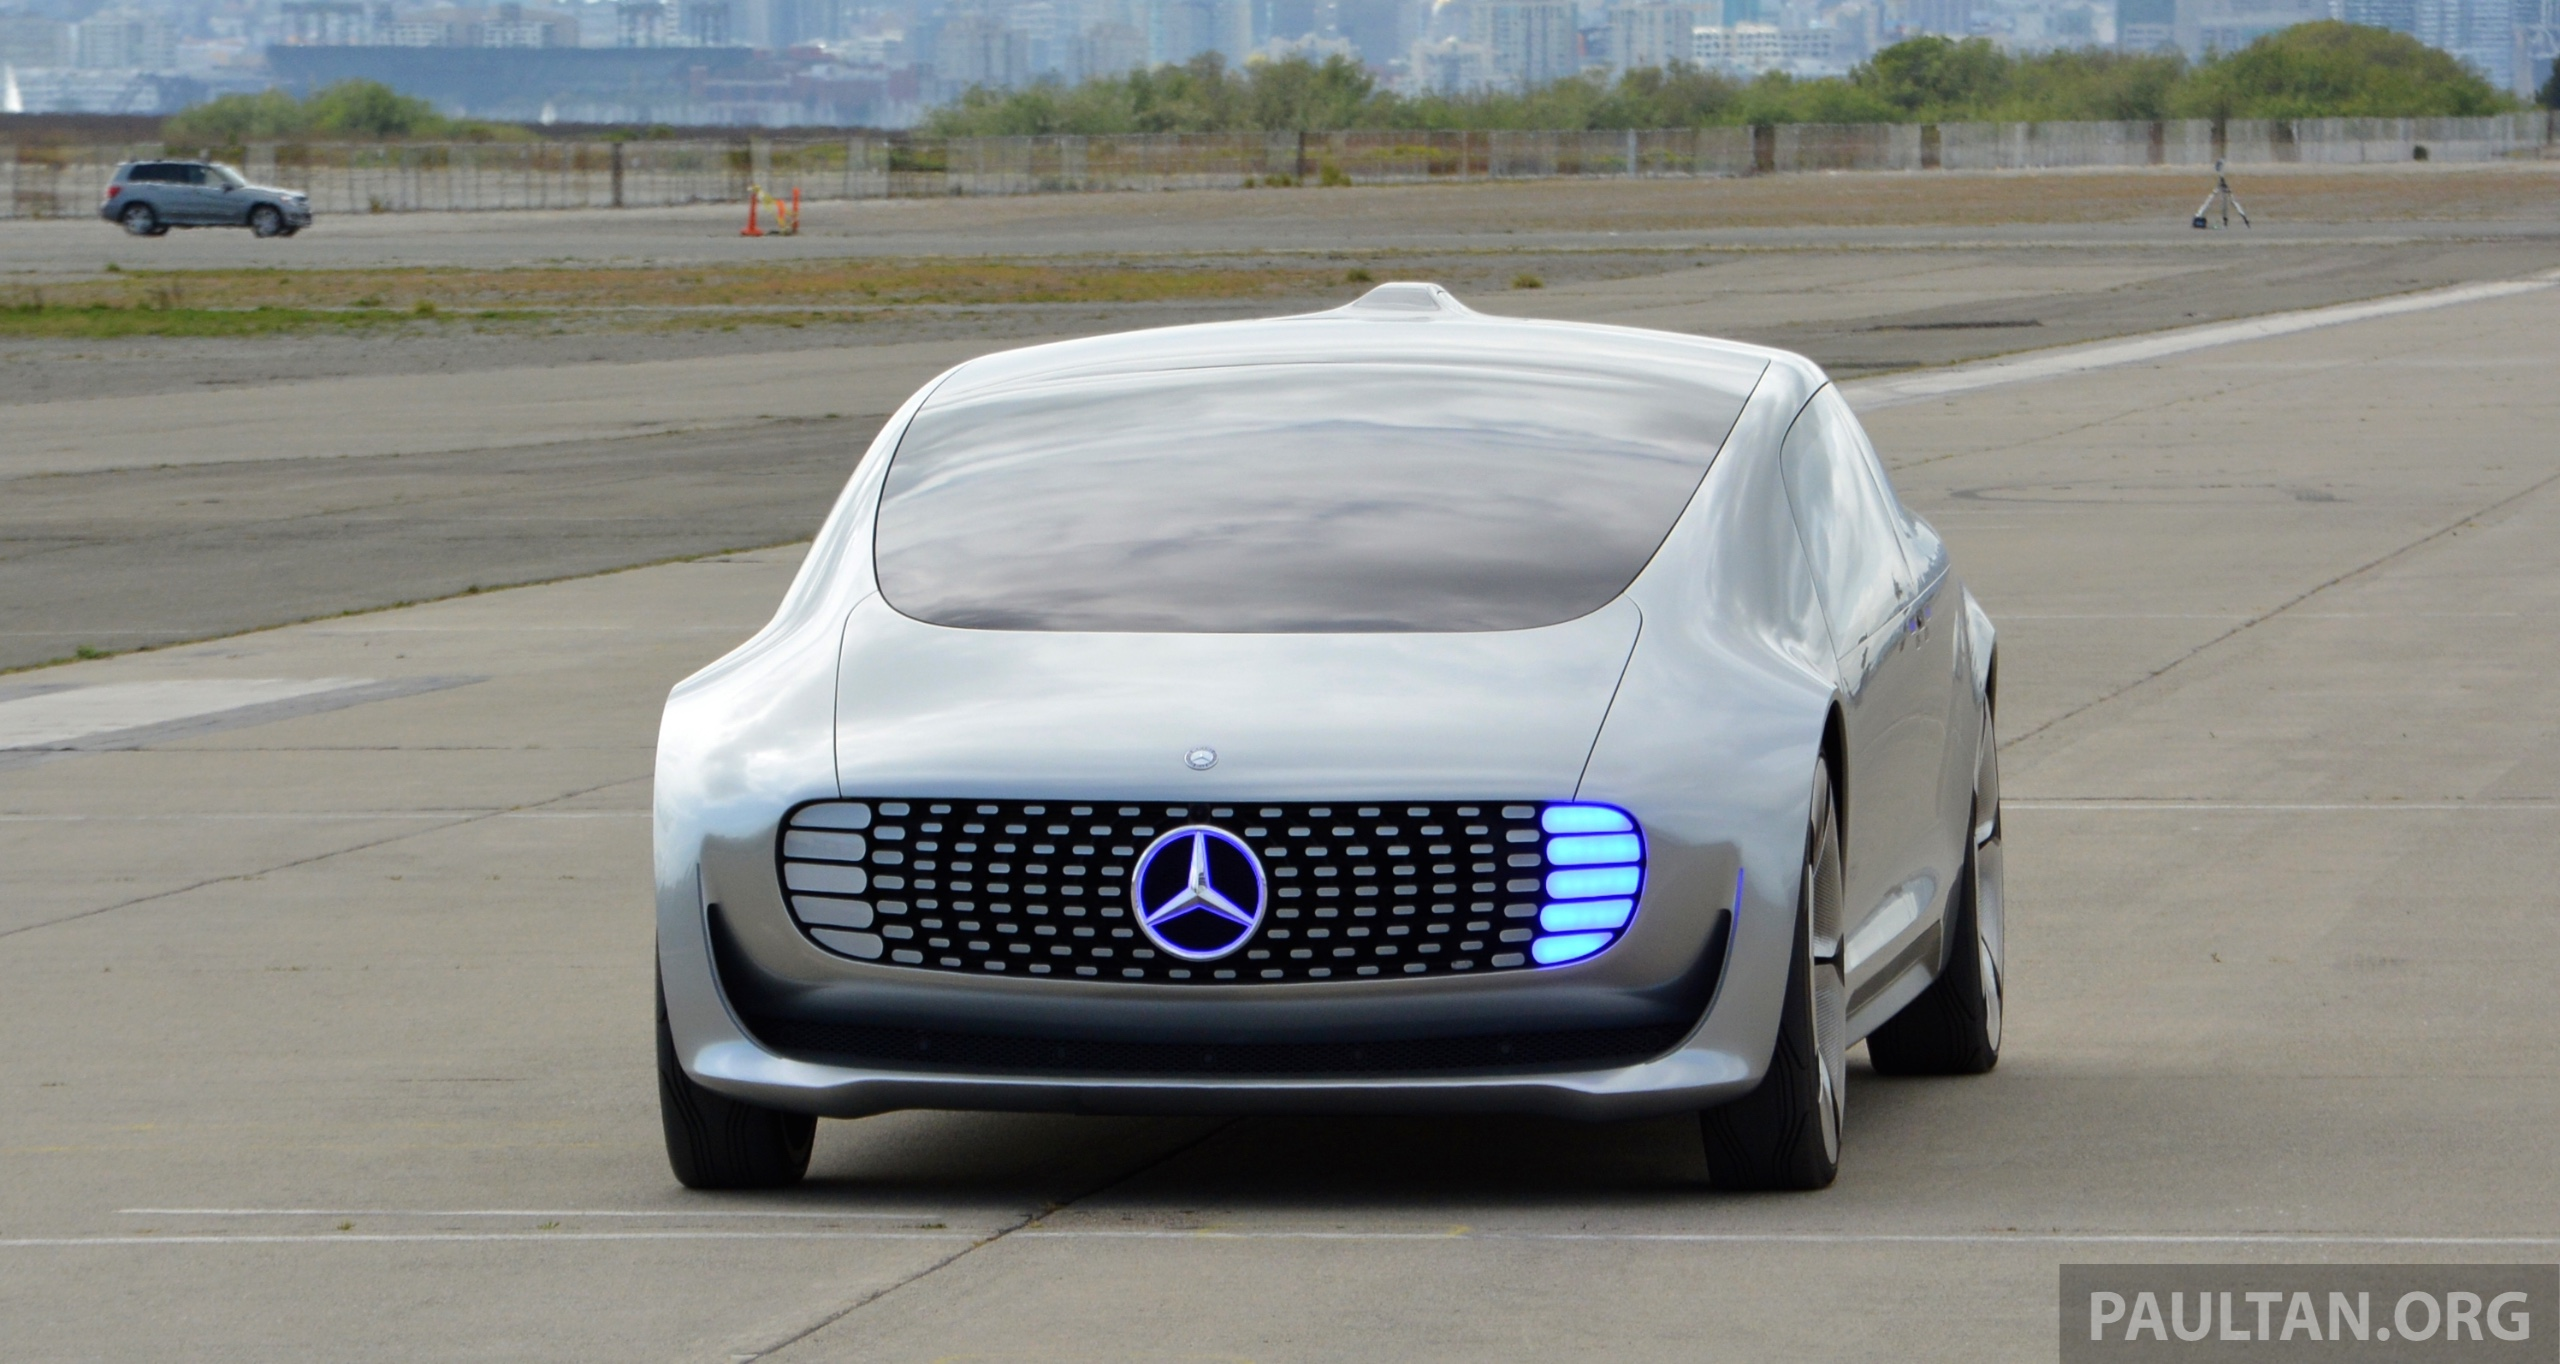 Driven Mercedes Benz F 015 Luxury In Motion In Sf Paul